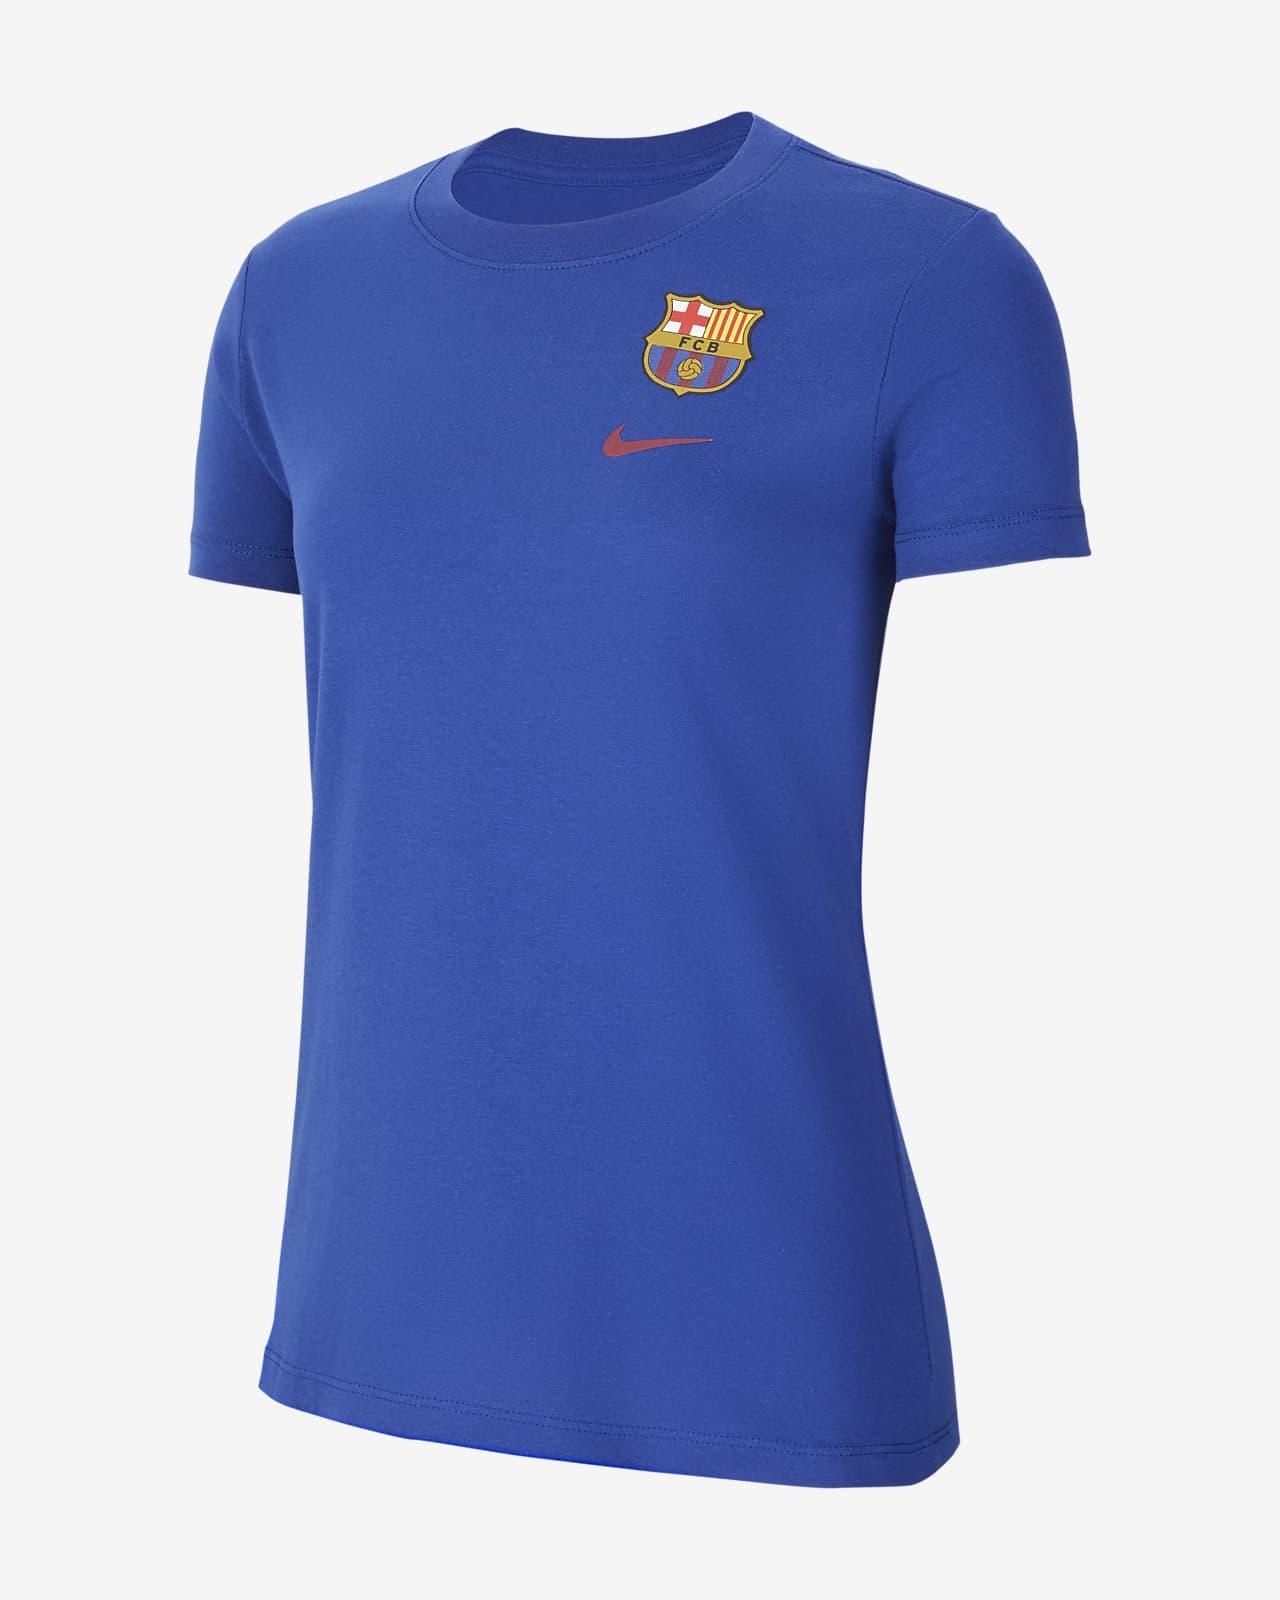 Tee-shirt FC Barcelona pour Femme